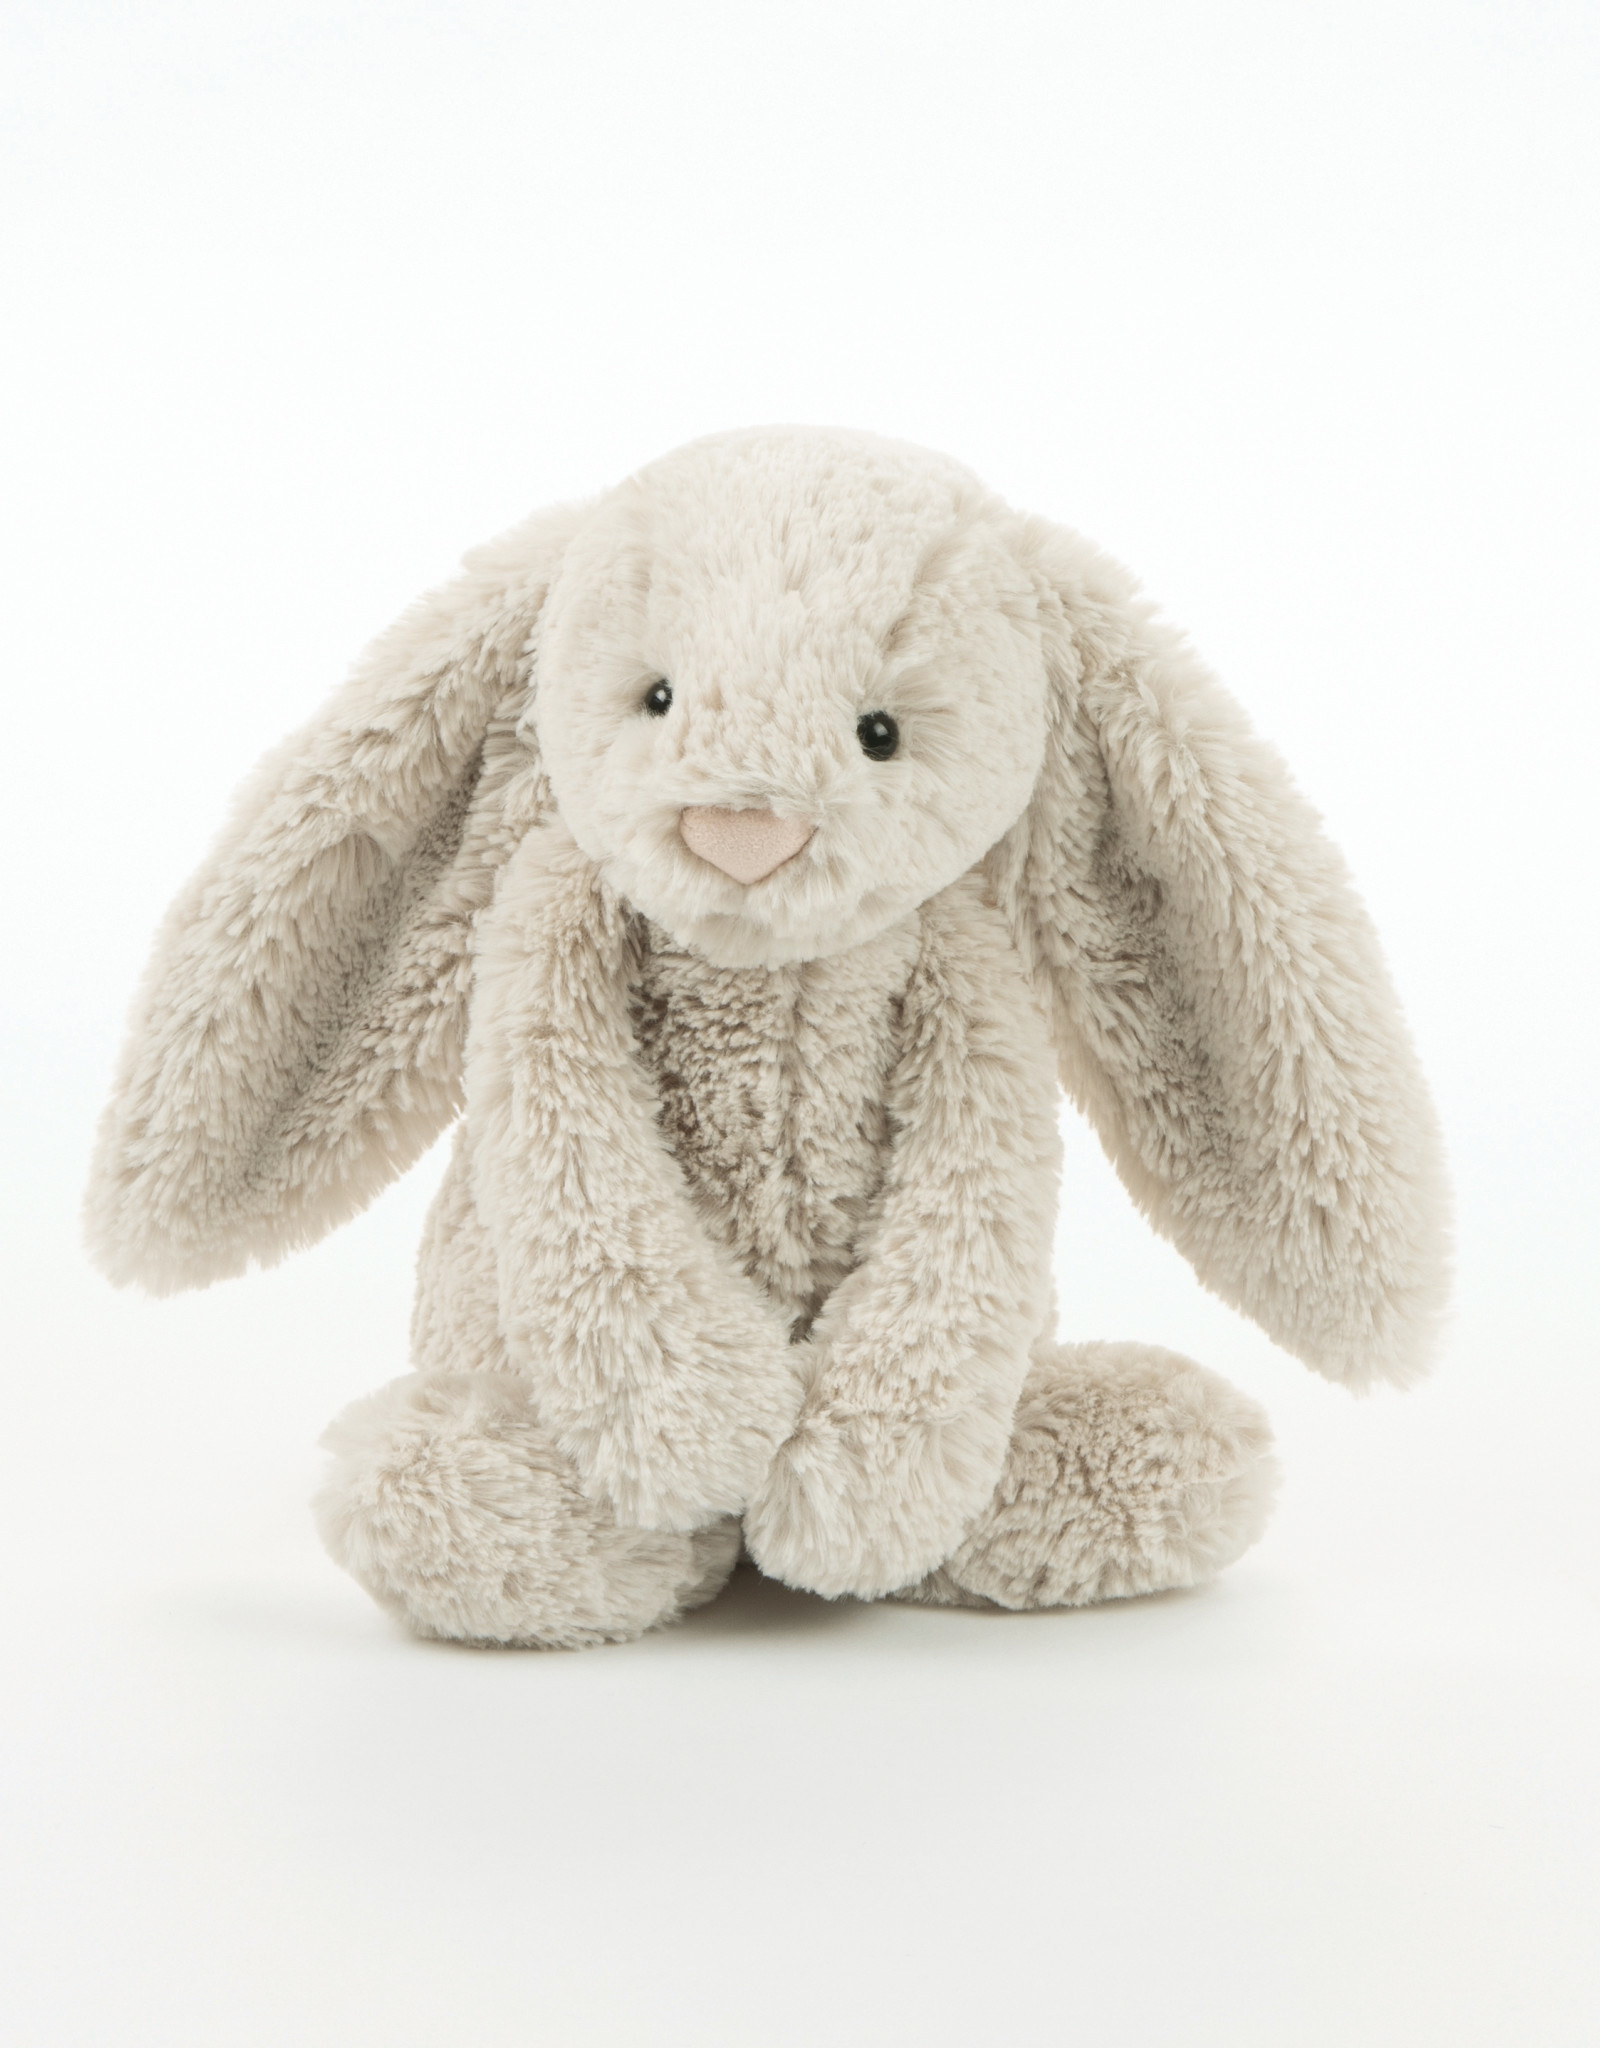 Jellycat bashful oatmeal bunny- small